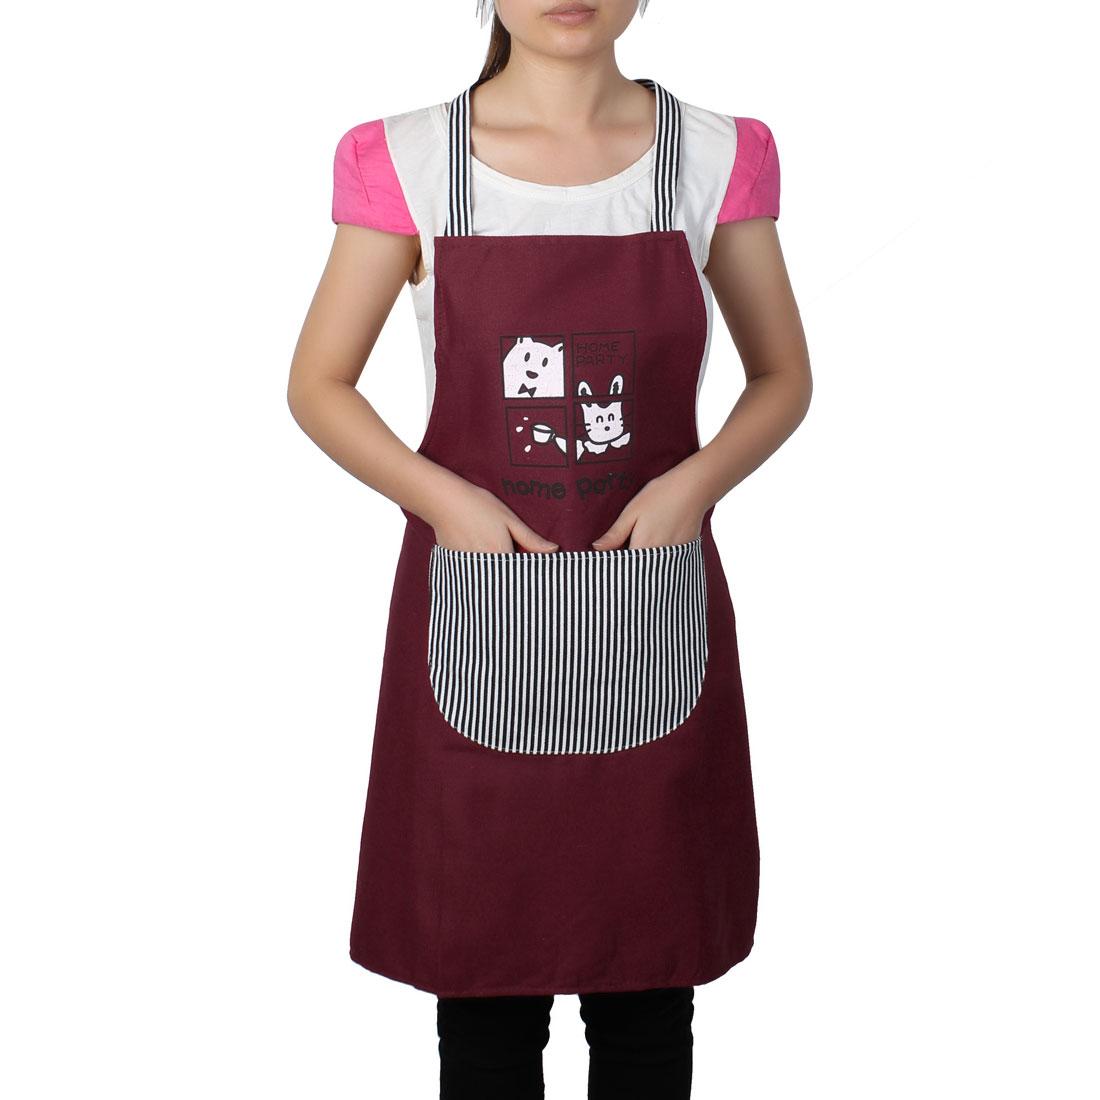 Women Home Kitchen Restaurant Bib Cooking Pocket Aprons Burgundy